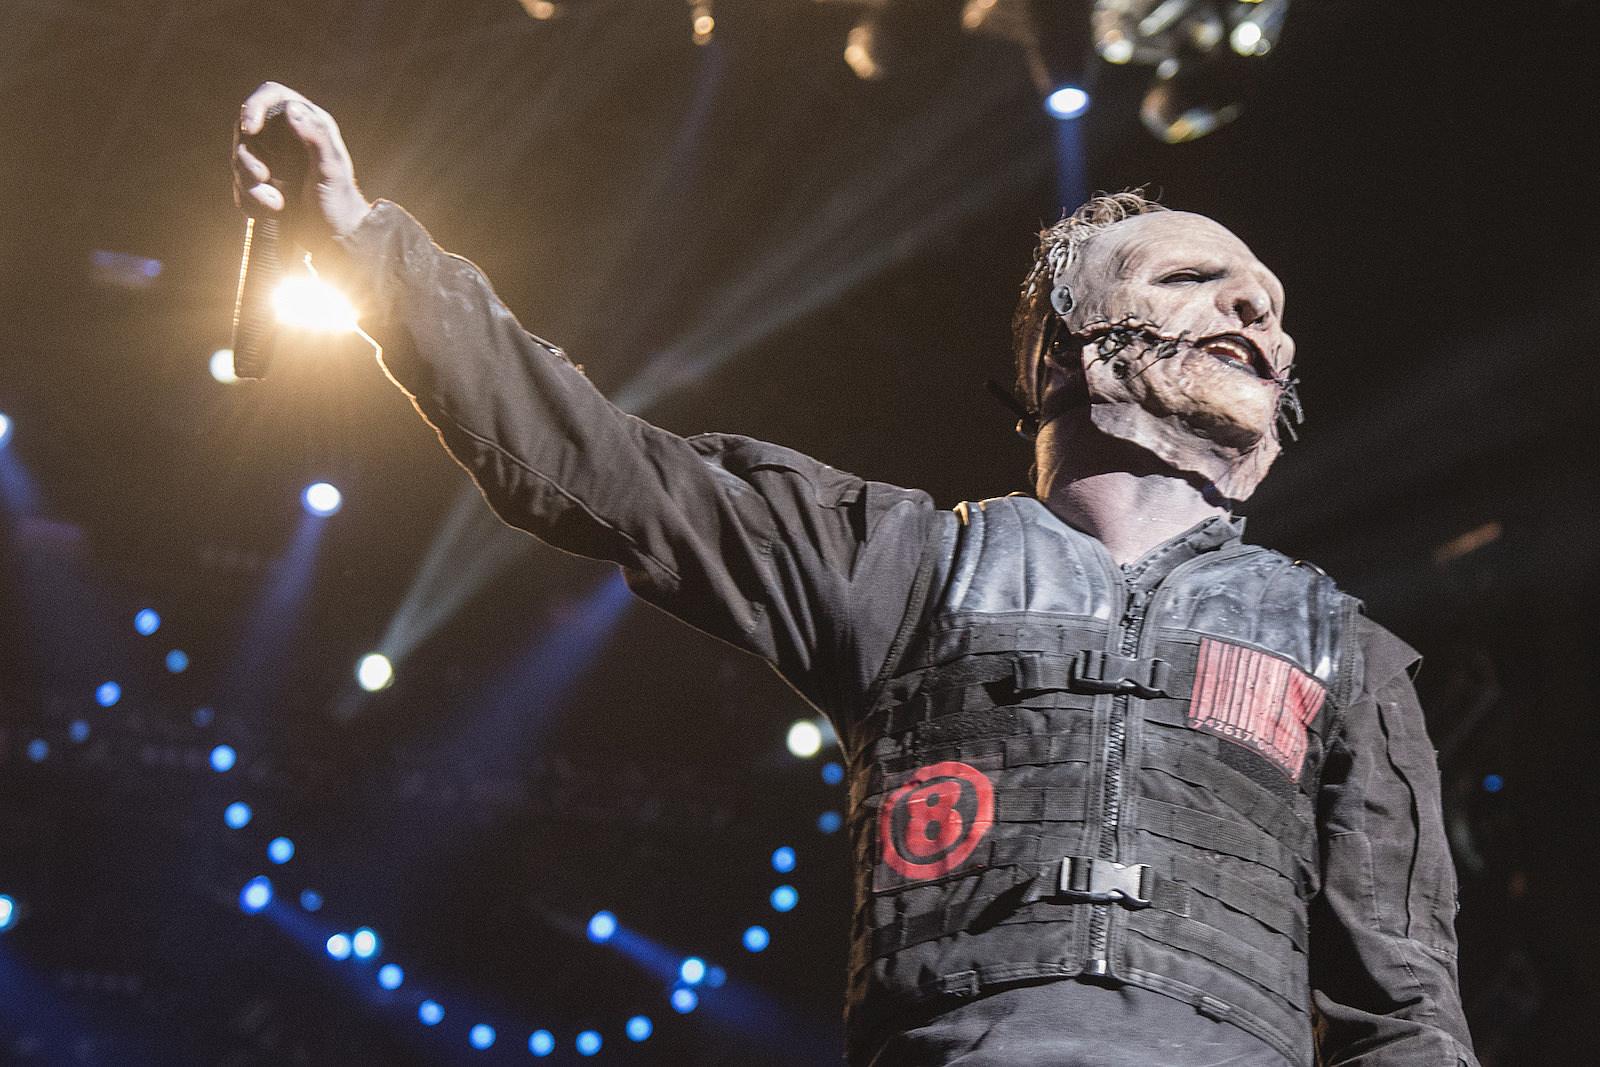 Slipknot Announce Knotfest Roadshow Tour and New Album